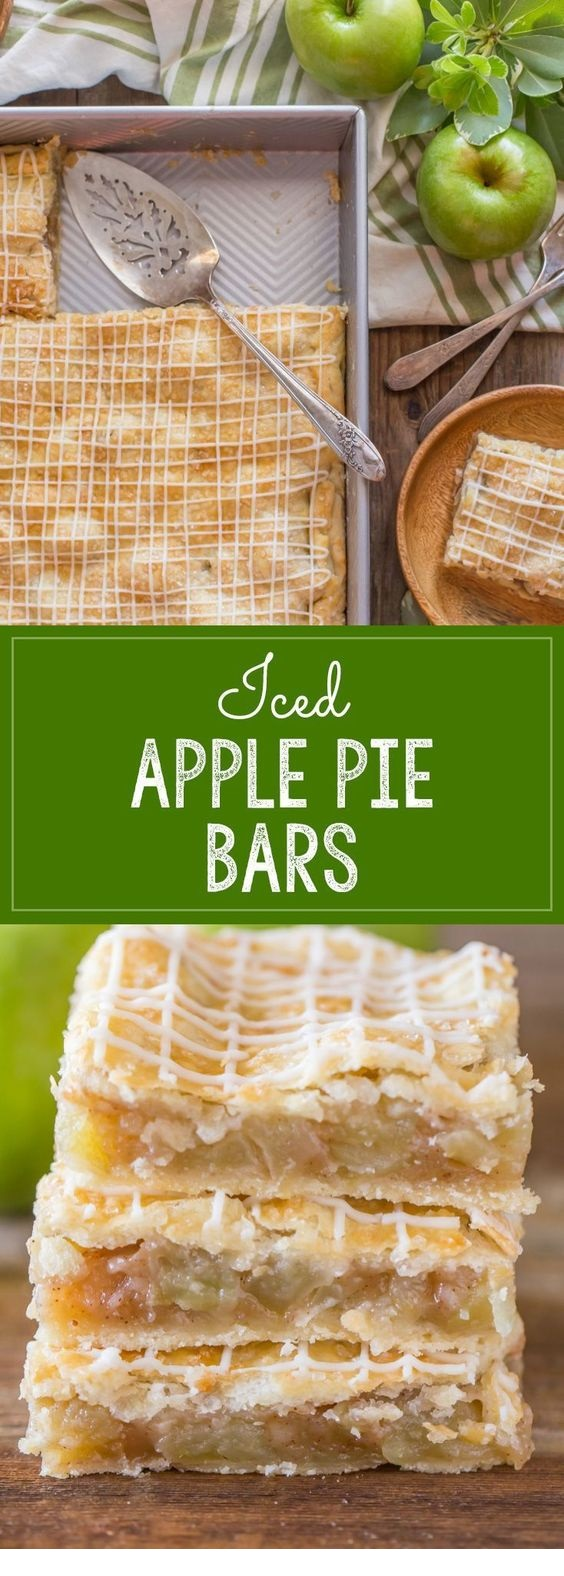 Iced Apple Pie Bars